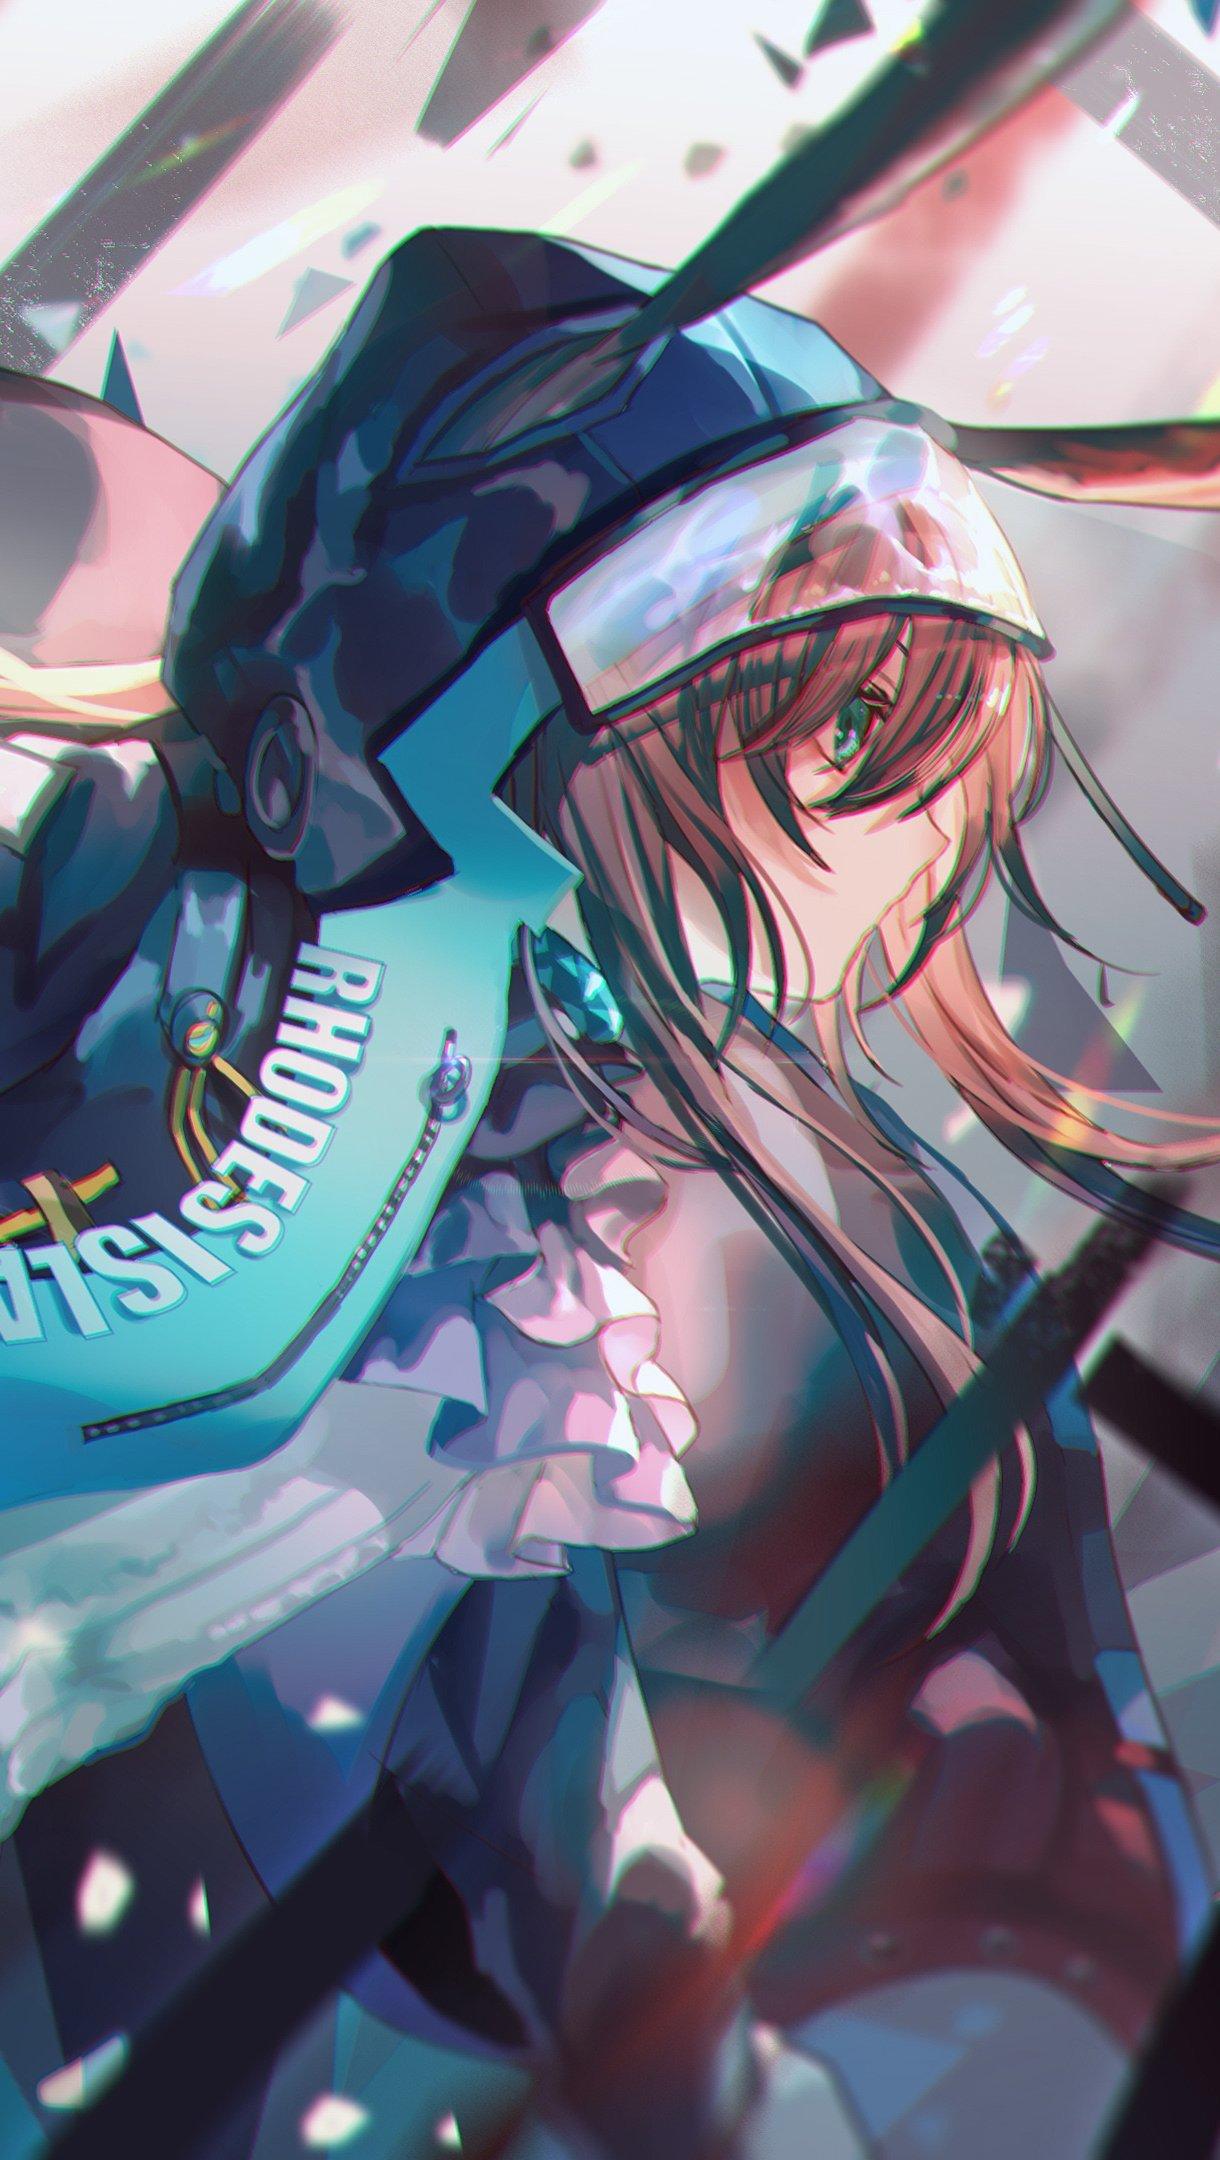 Fondos de pantalla Anime Amiya de Arknights Vertical